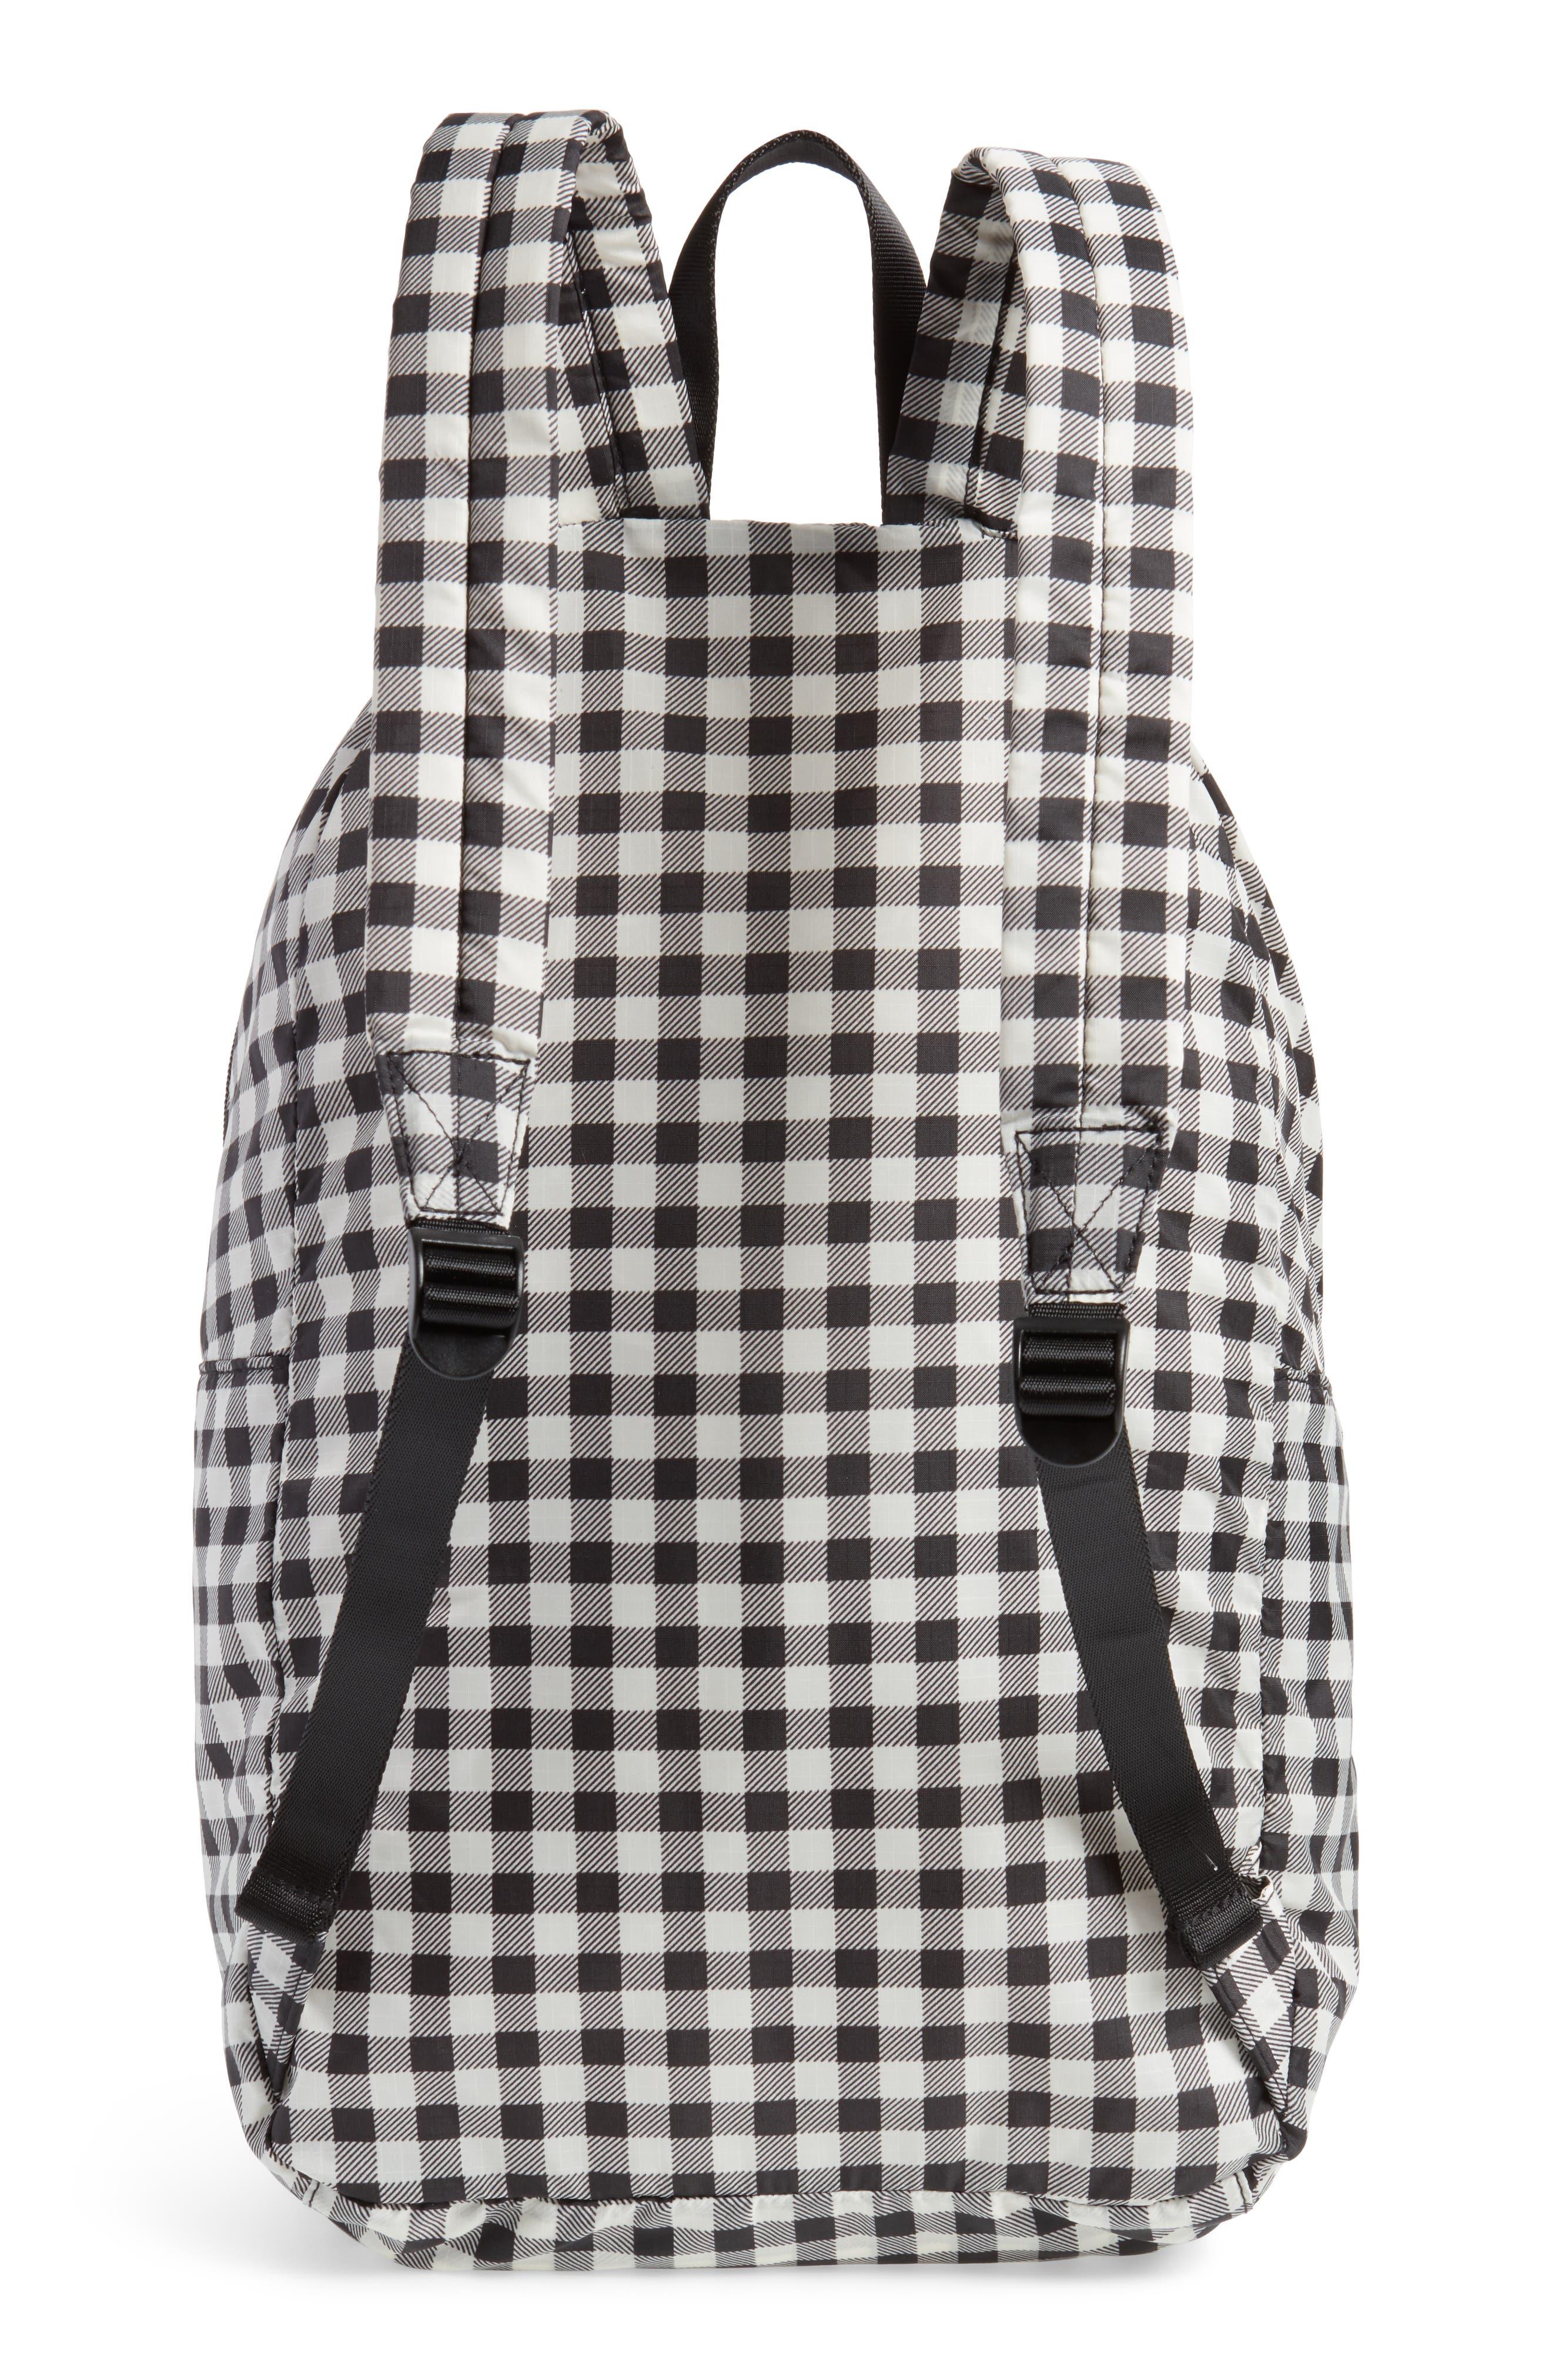 Ripstop Nylon Backpack,                             Alternate thumbnail 3, color,                             006